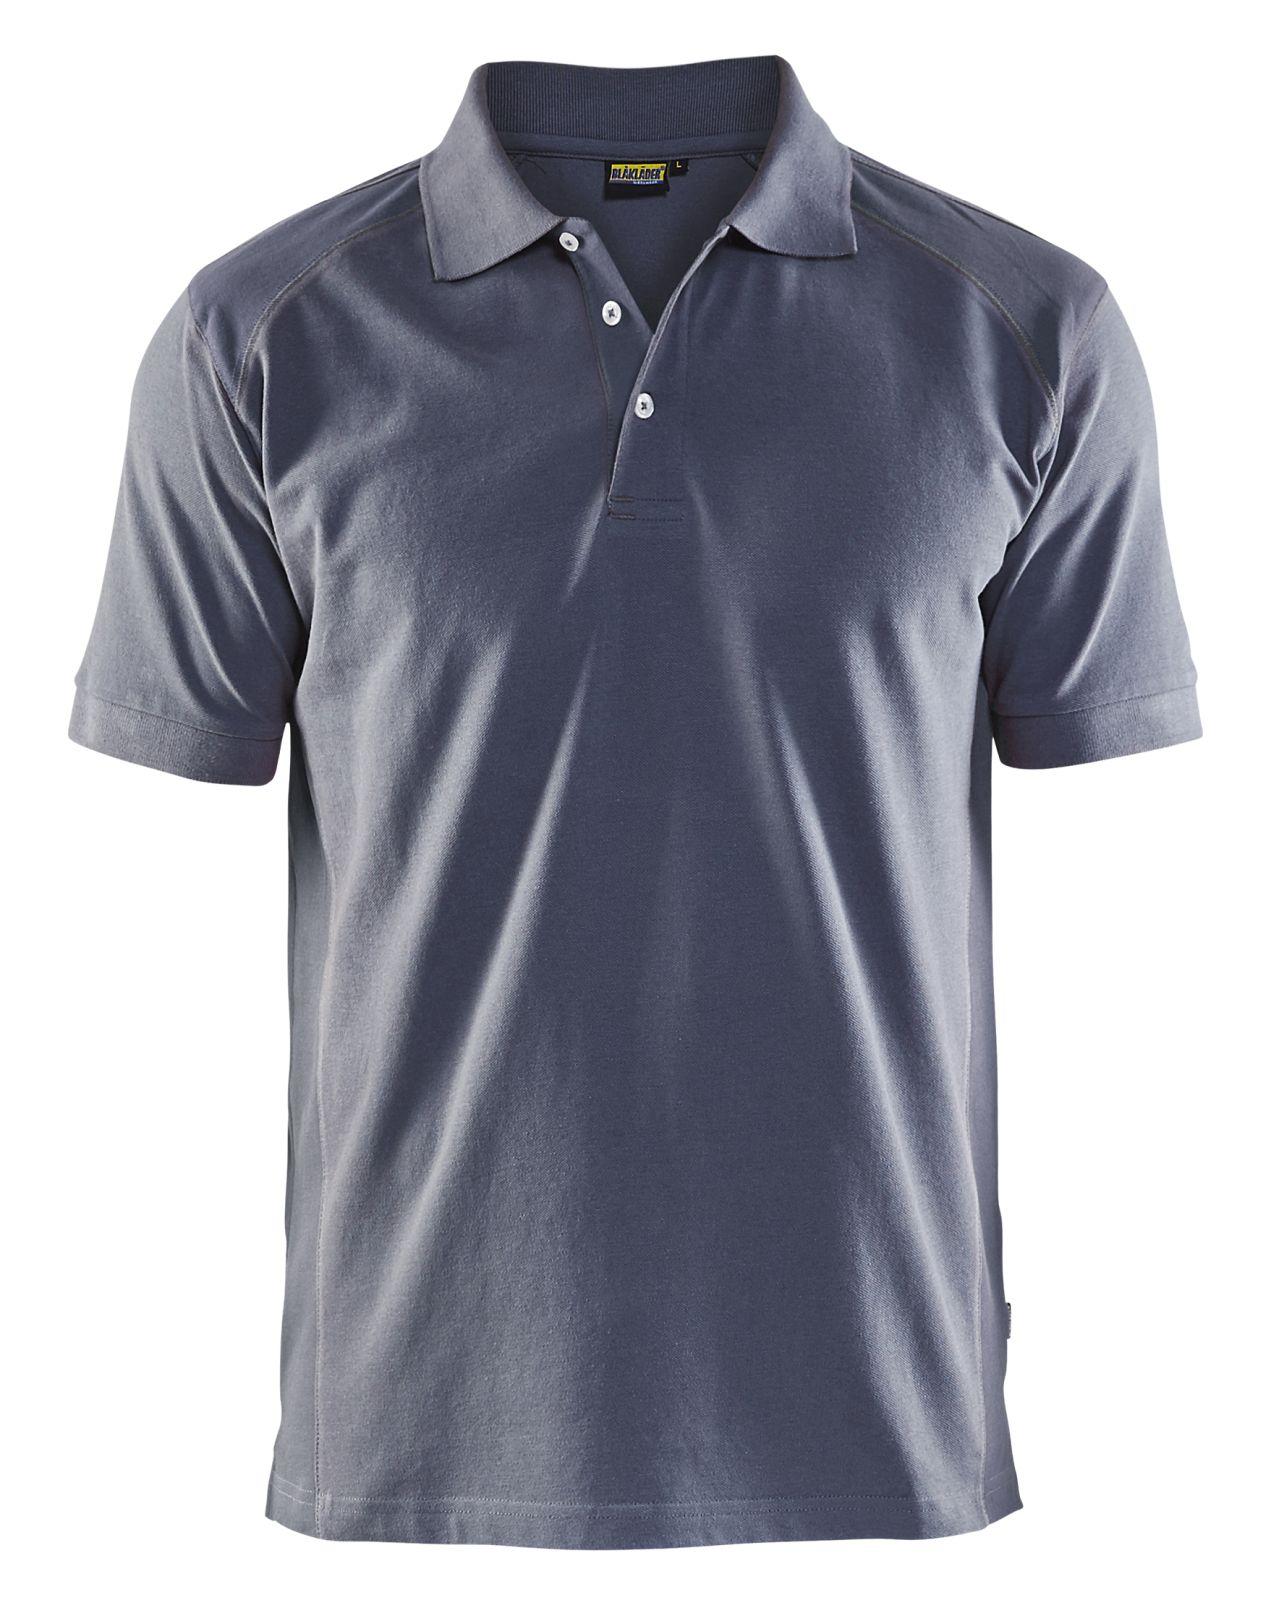 Blaklader Polo shirts 33241050 grijs(9400)